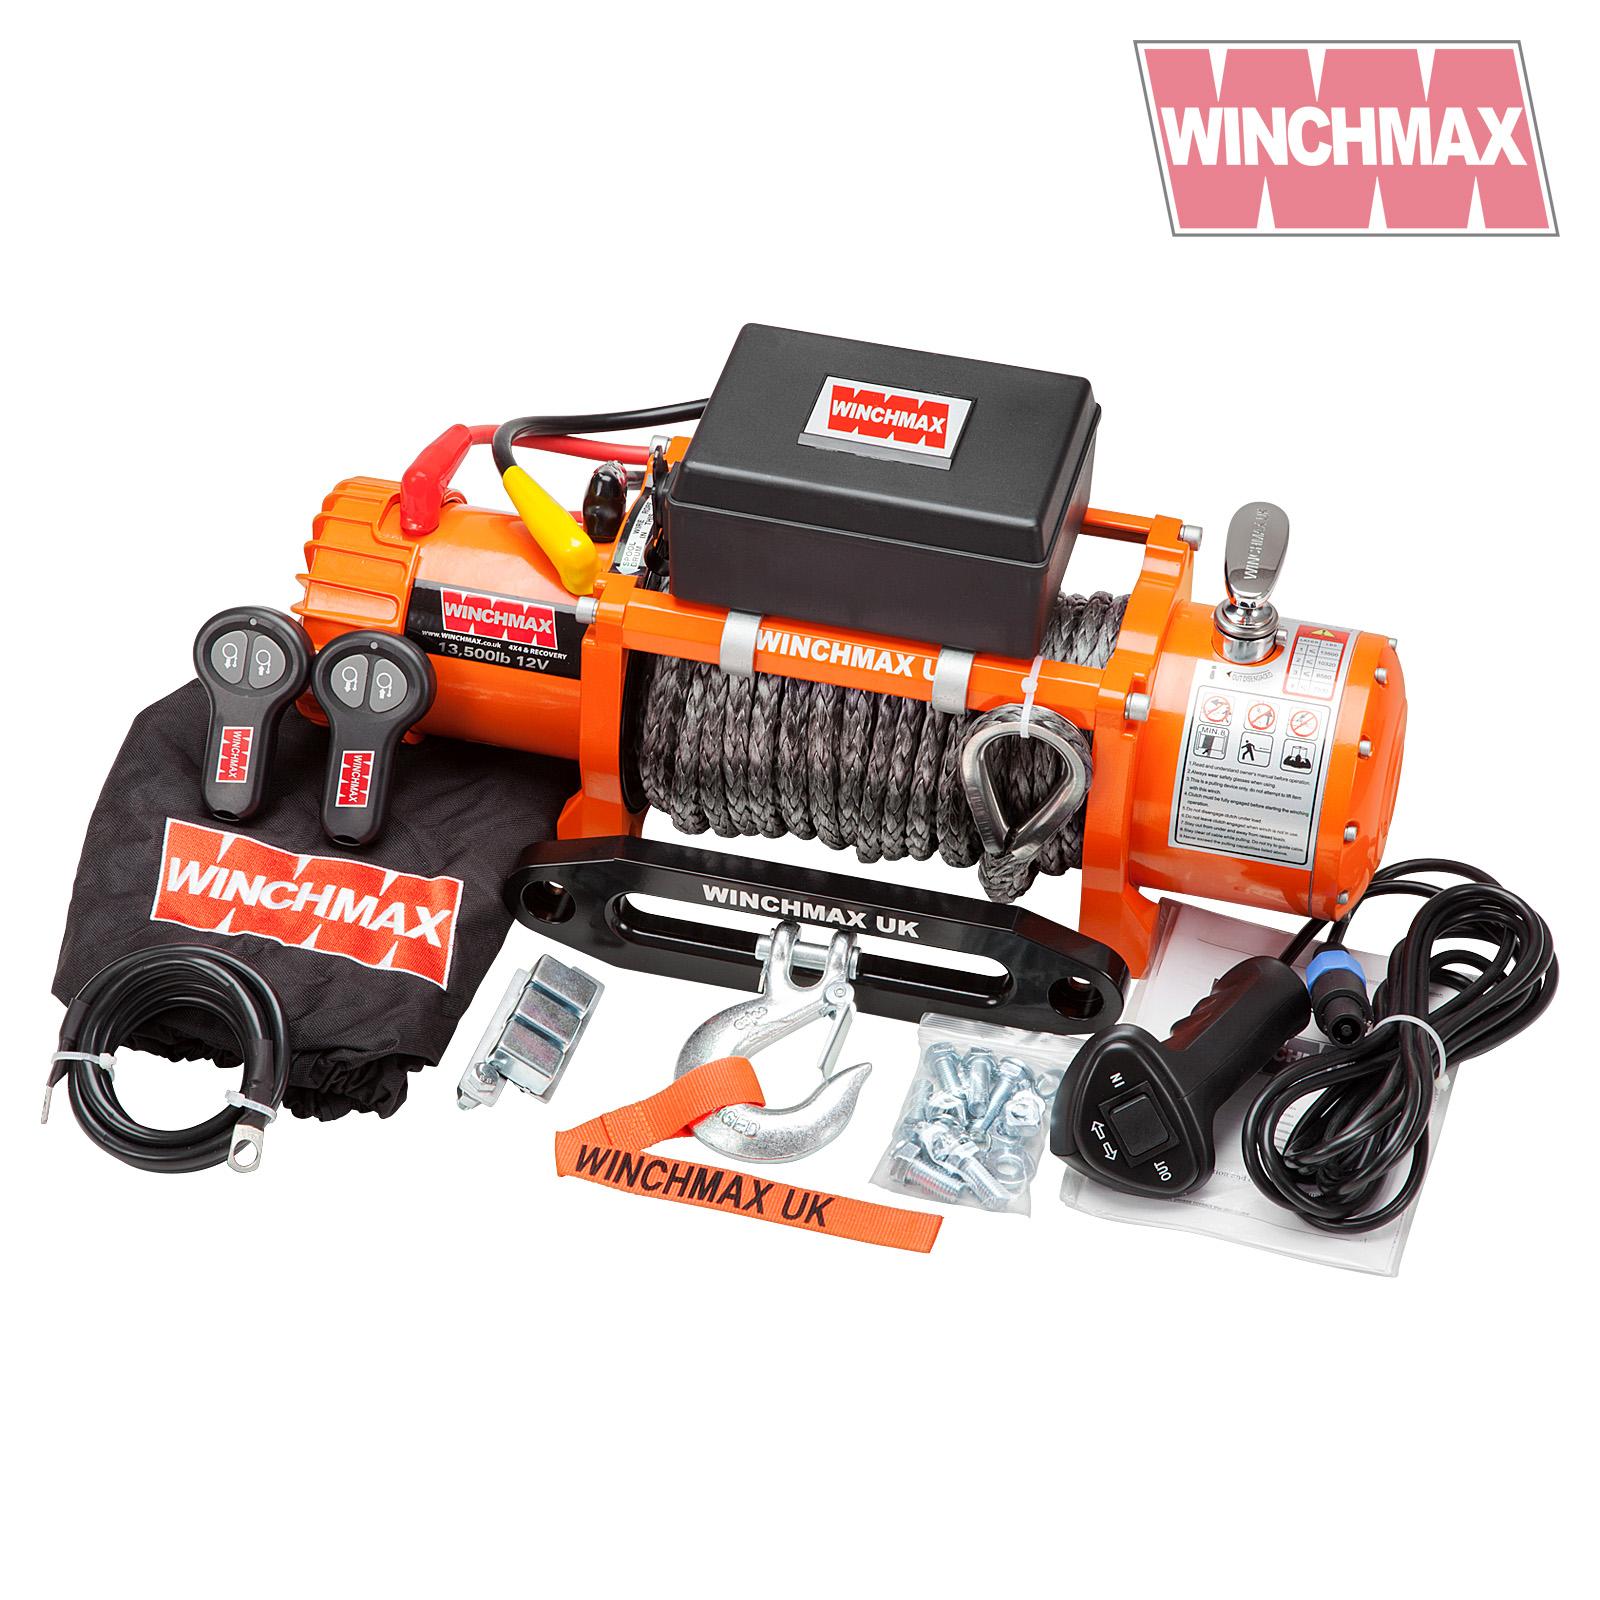 Wm1350012vsyn winchmax 493